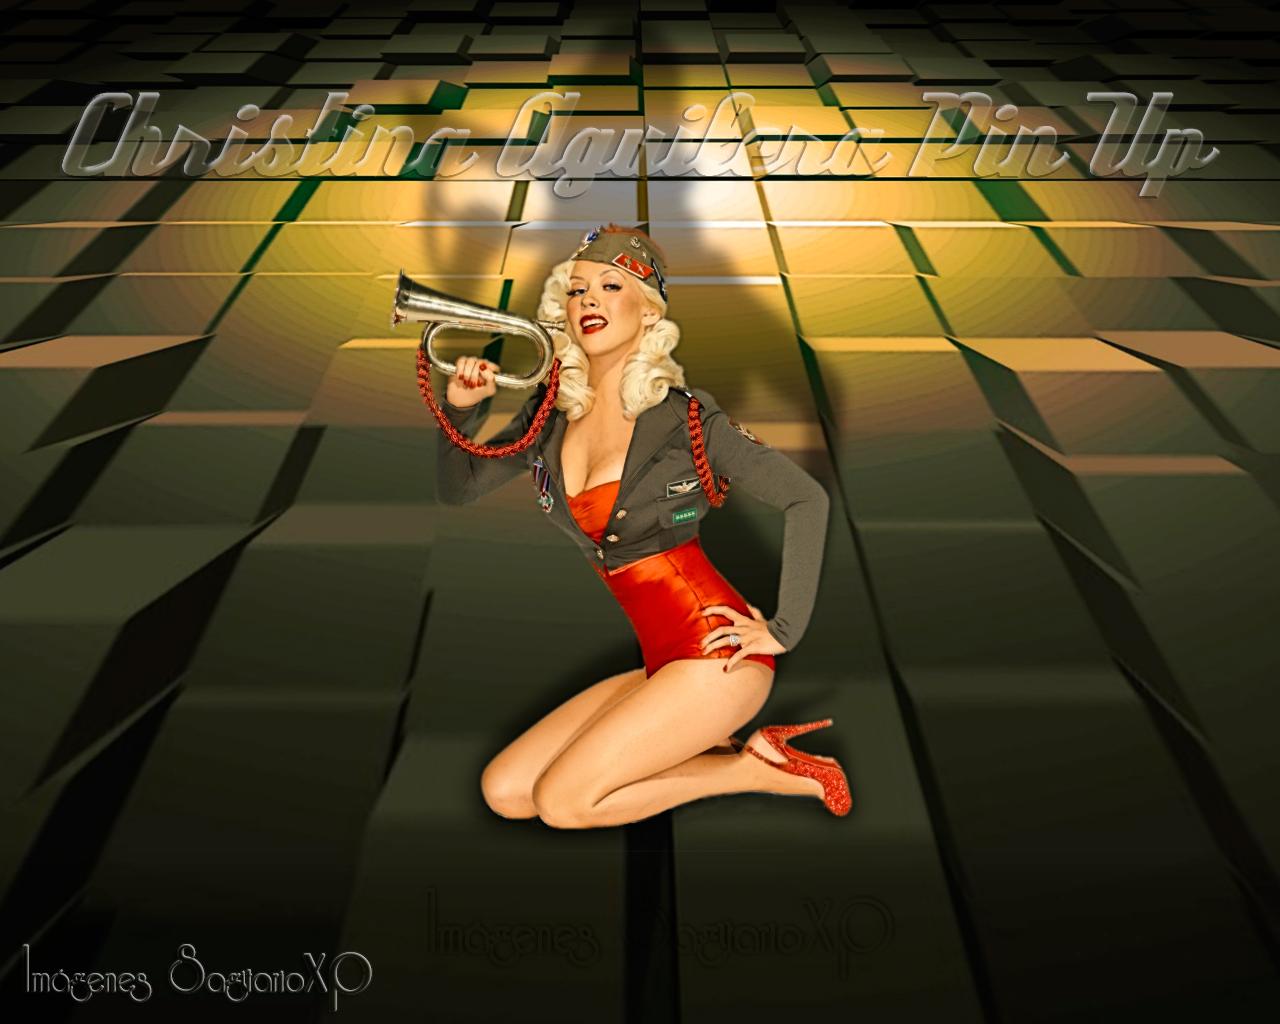 http://1.bp.blogspot.com/-kHn3tSYHWN0/UN8gcRcFZqI/AAAAAAAAJiw/TfkUK50TopI/s1600/Christina-Aguilera-Pin-Up-3D.jpg